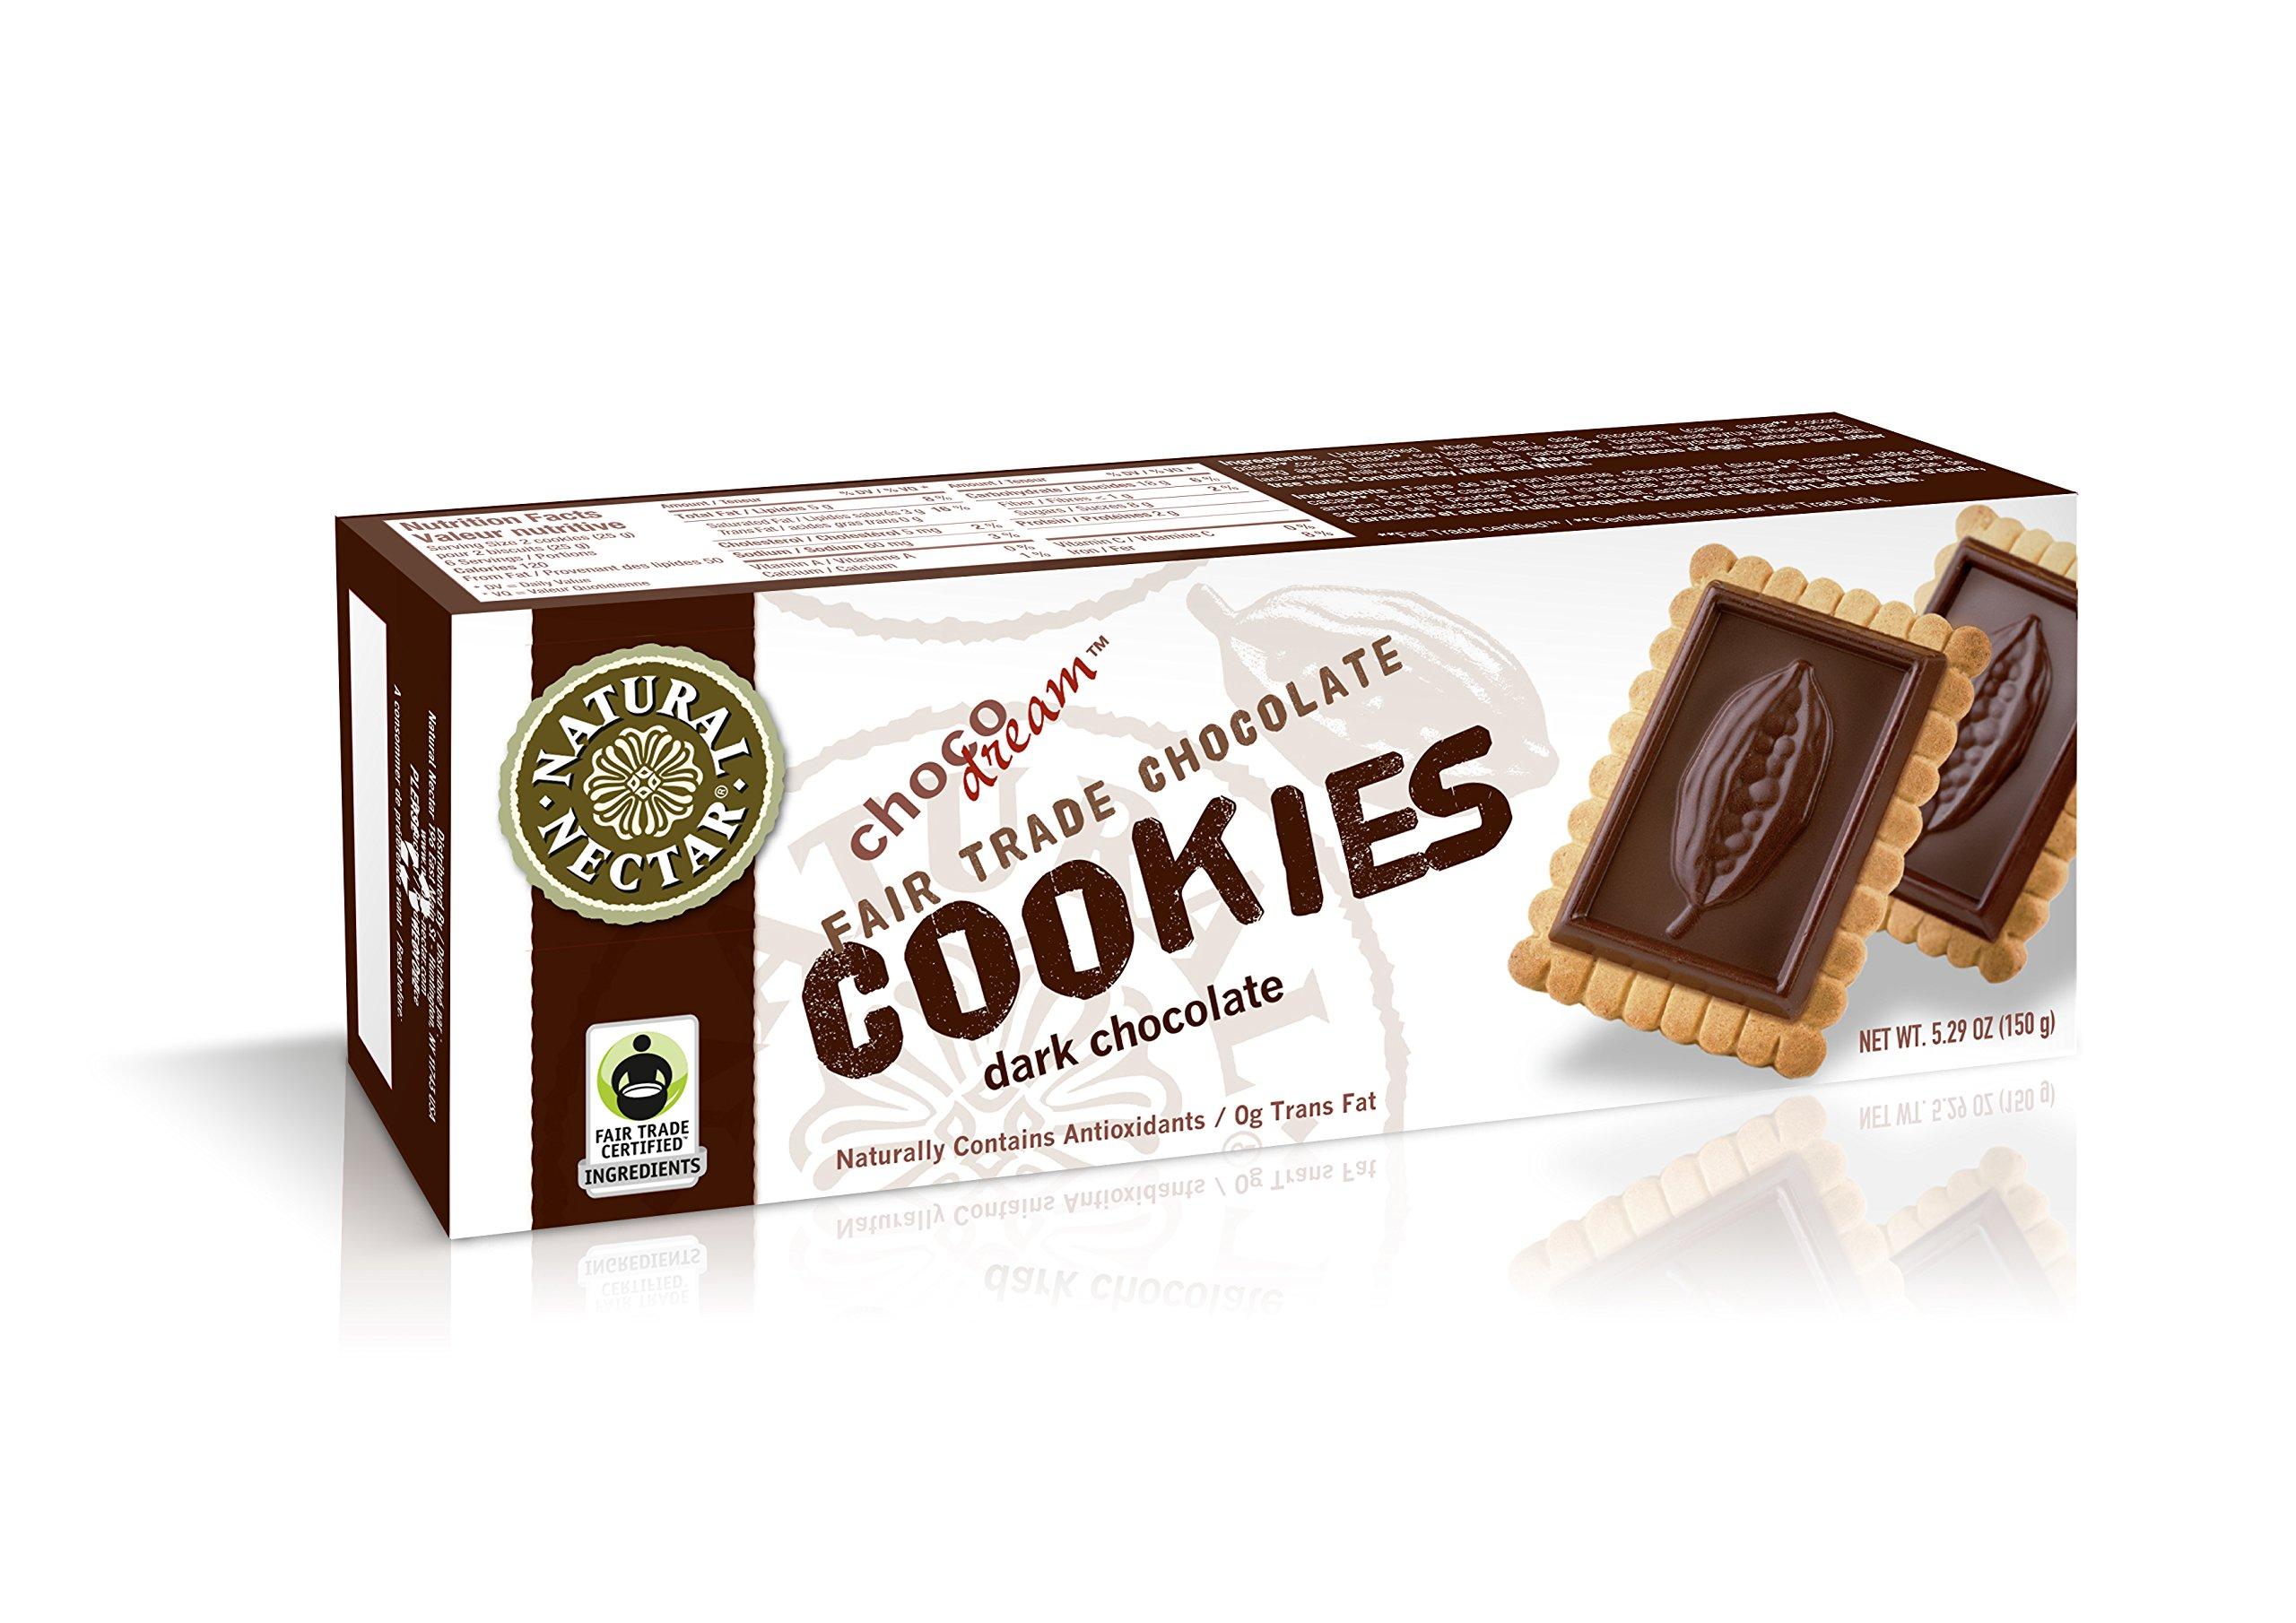 Natural Nectar ChocoDream Cookies, Dark Chocolate, 5.29 Ounce Box (Pack of 12)